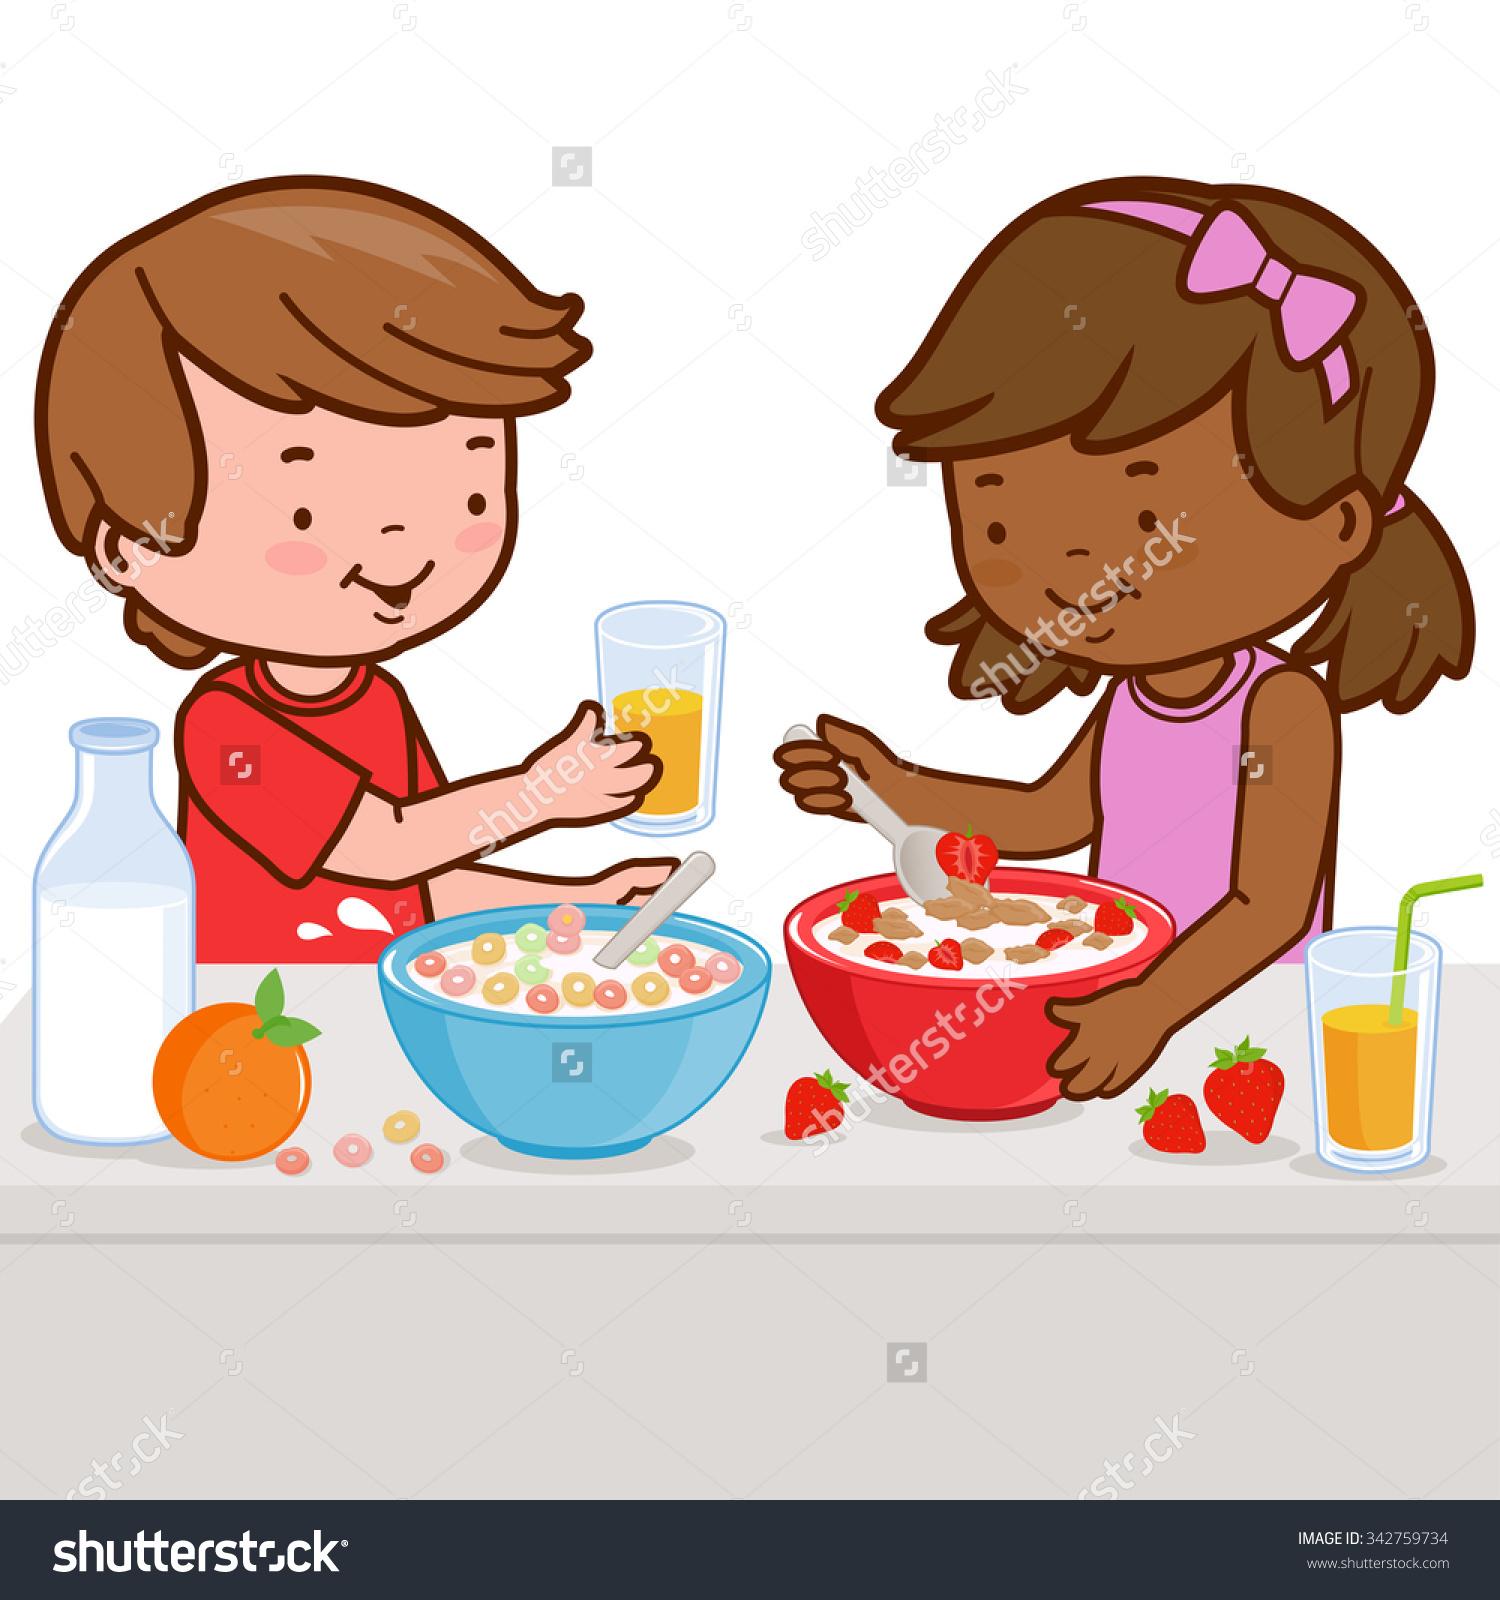 cereal clipart preschool #40915156